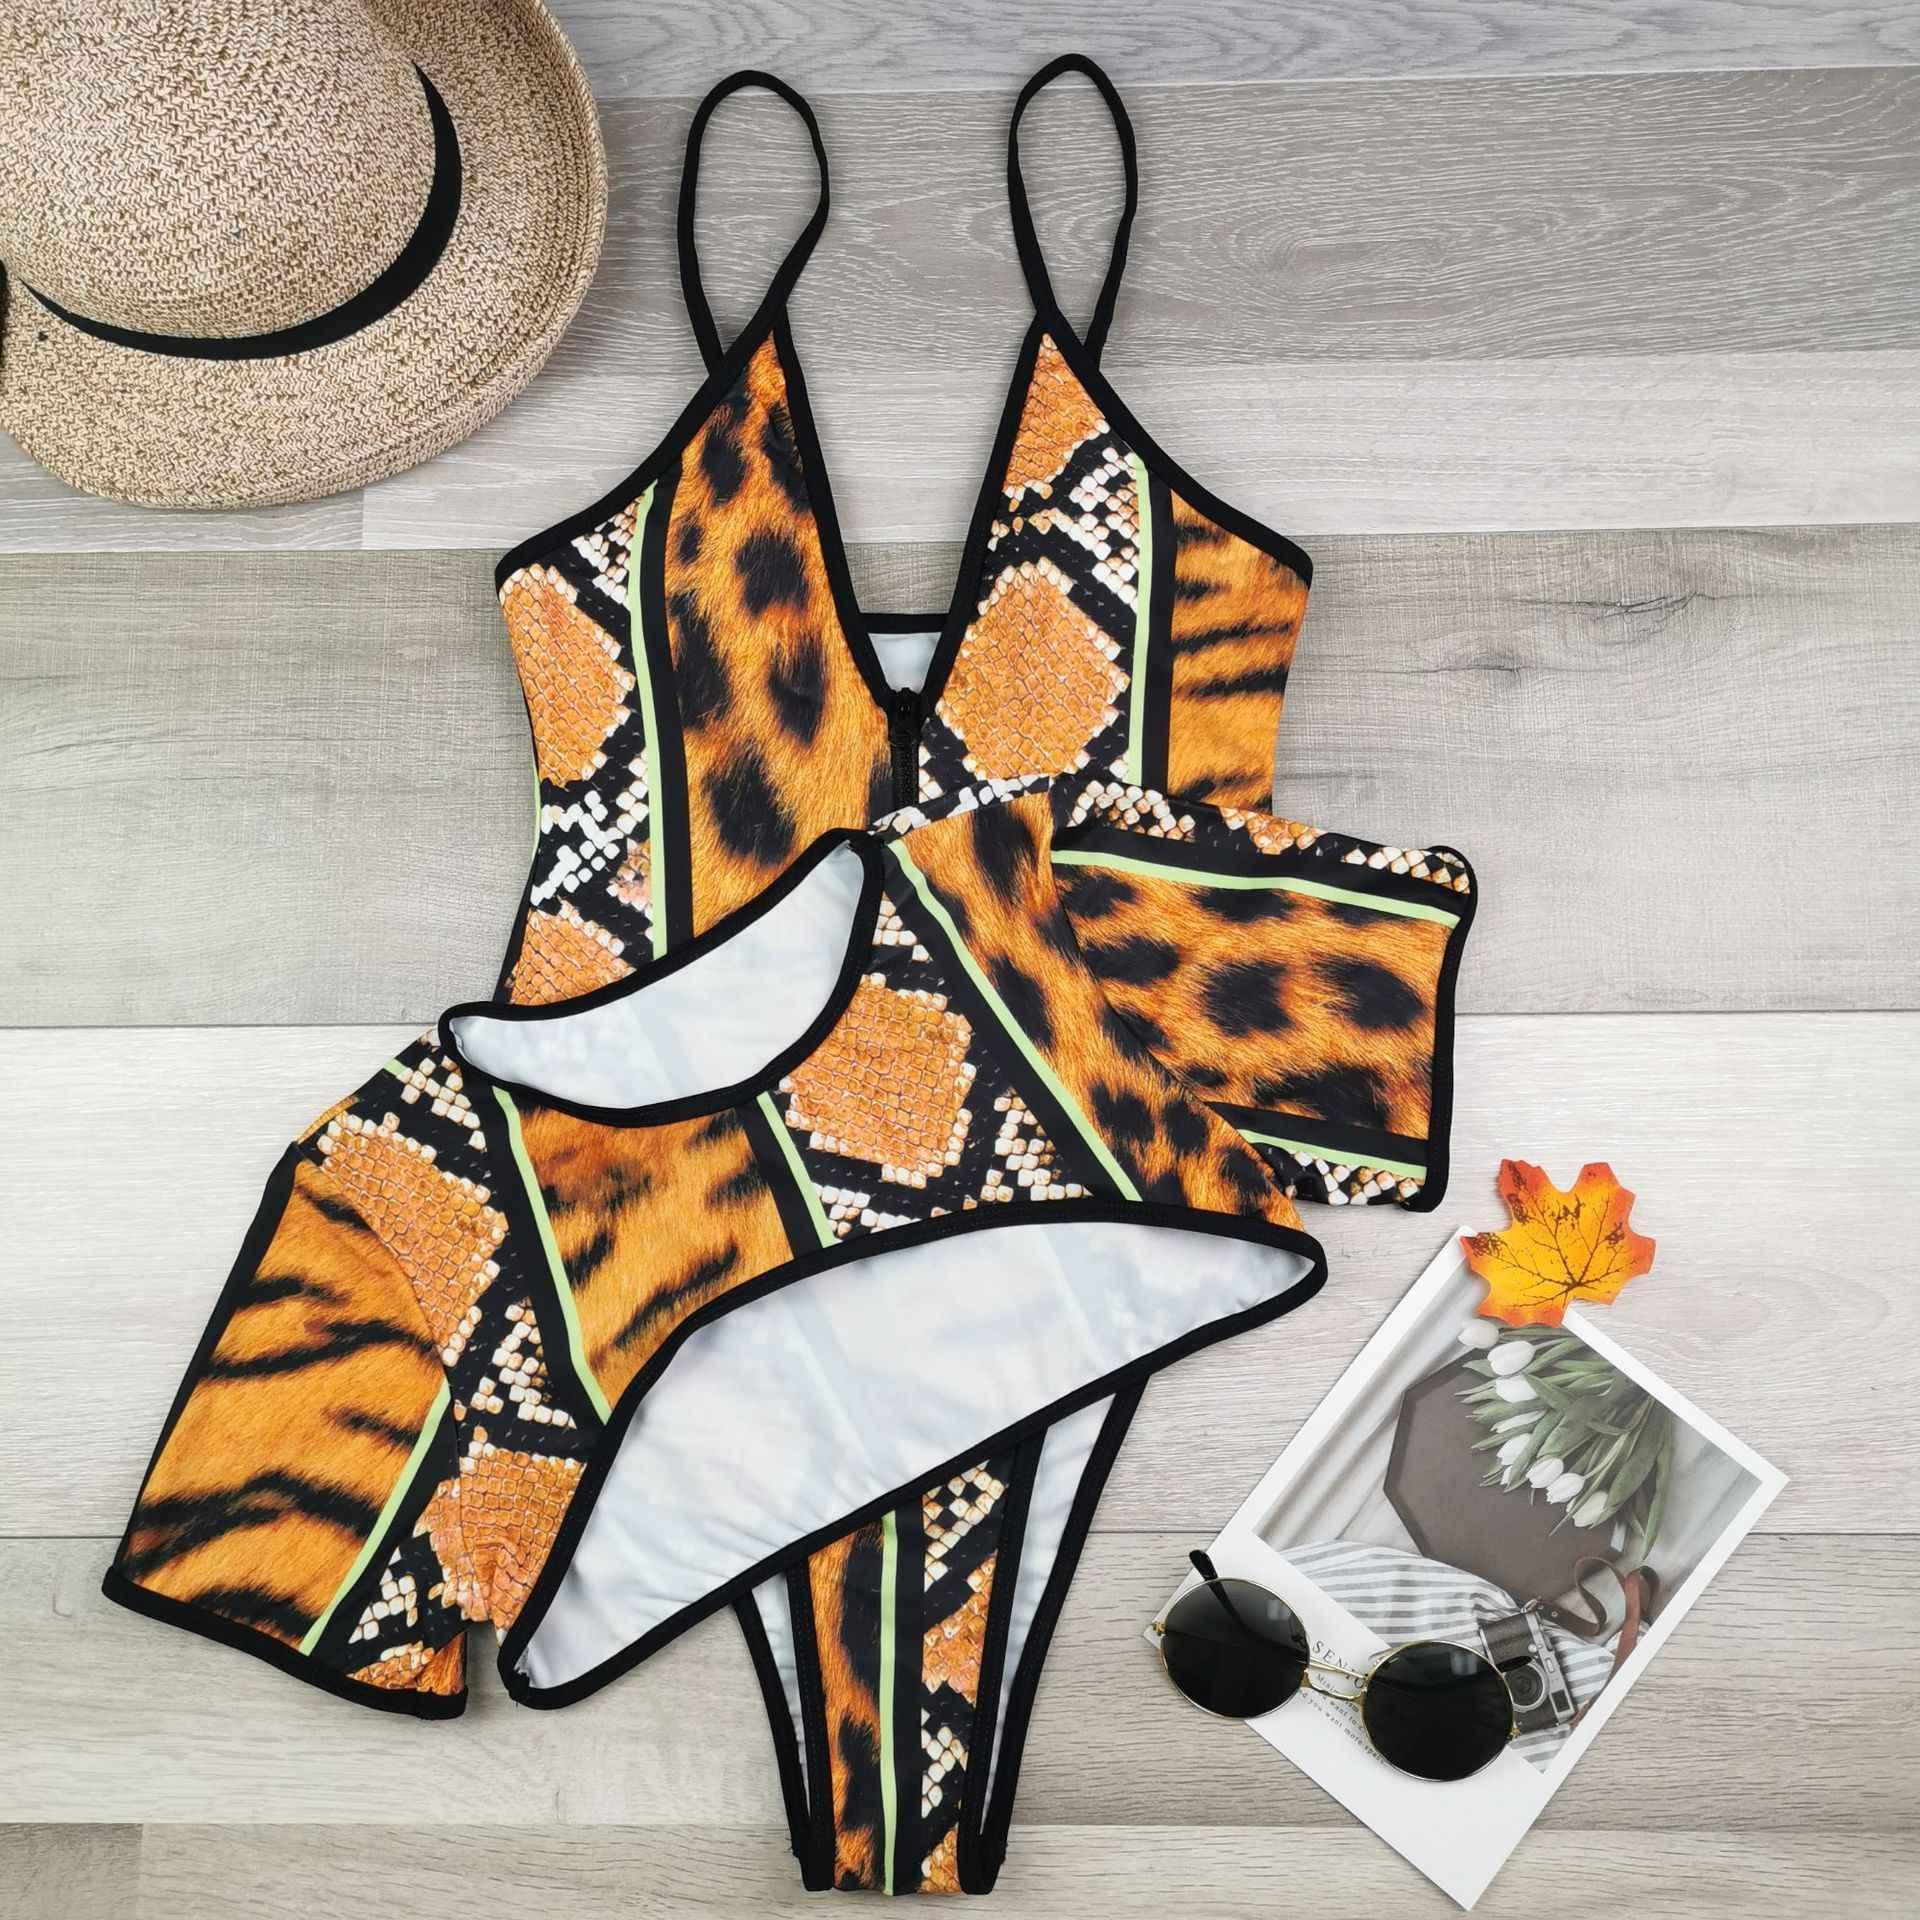 Ukuran Satu Potong Pakaian 2020 Hewan Gambar Push-Up Padded Brasil Swimsuit Set Pantai Monokini Mandi Baju Renang Bikini 5XL